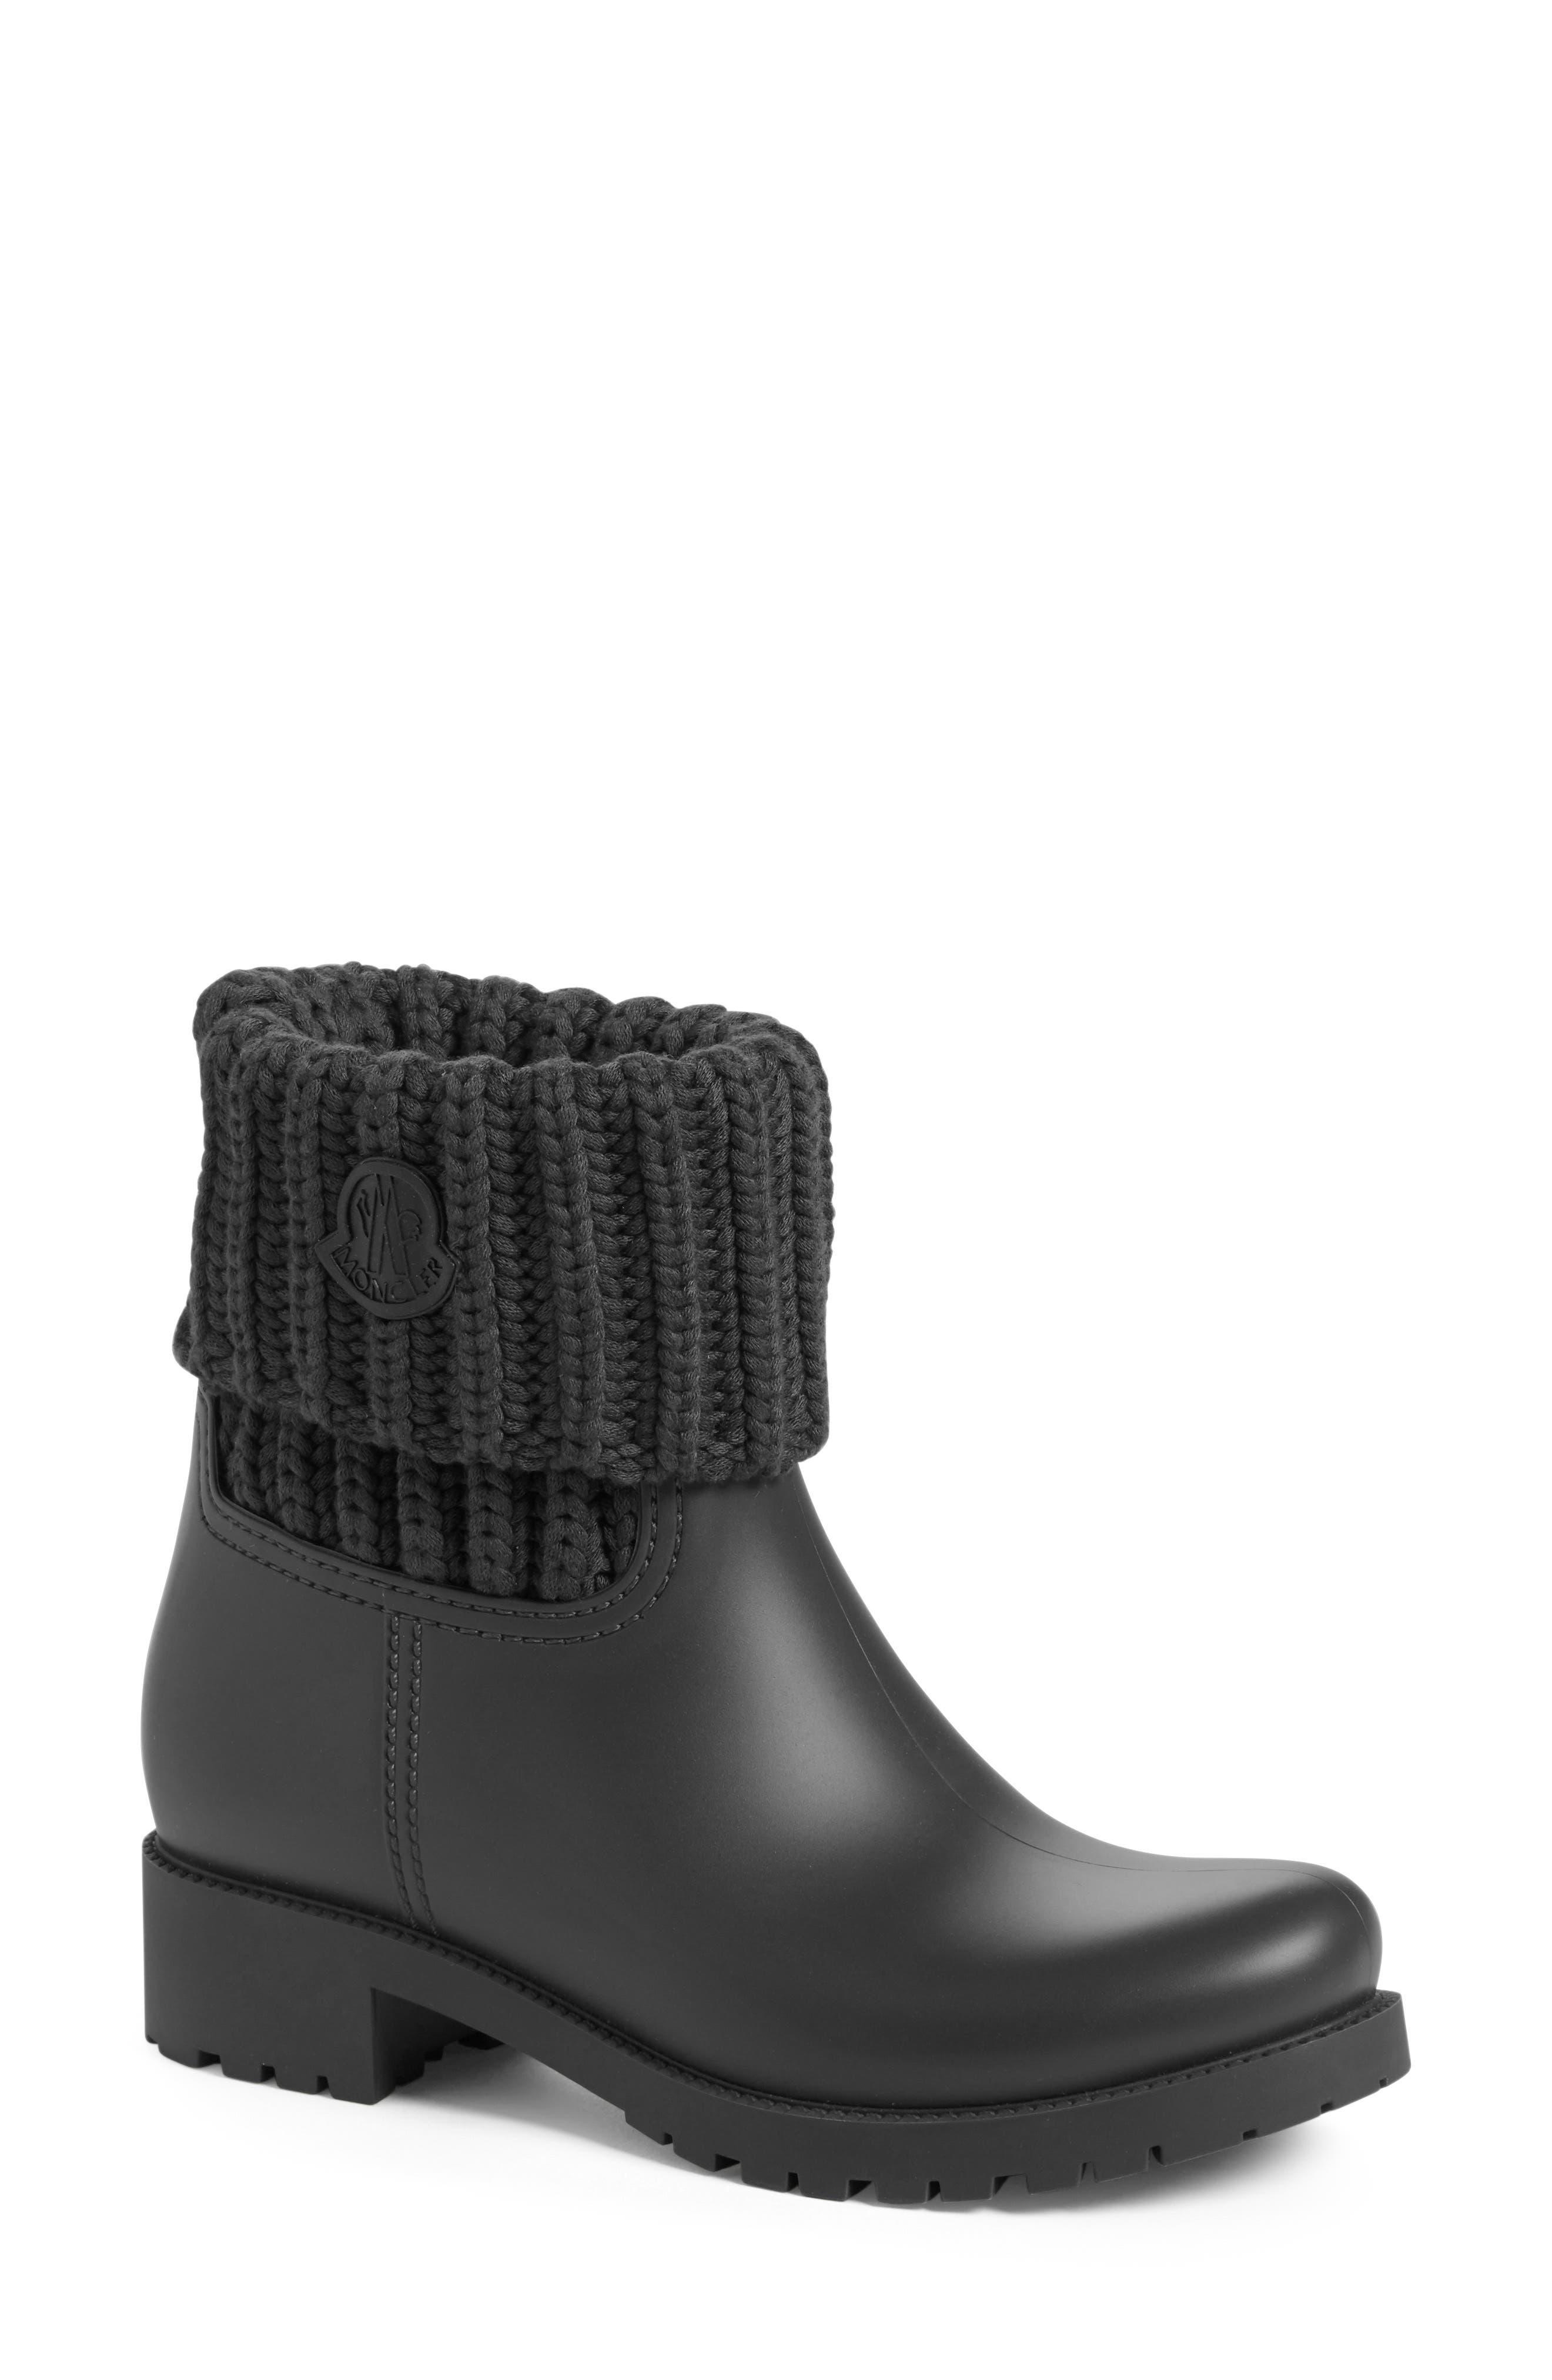 Main Image - Moncler 'Ginette' Knit Cuff Leather Rain Boot (Women)